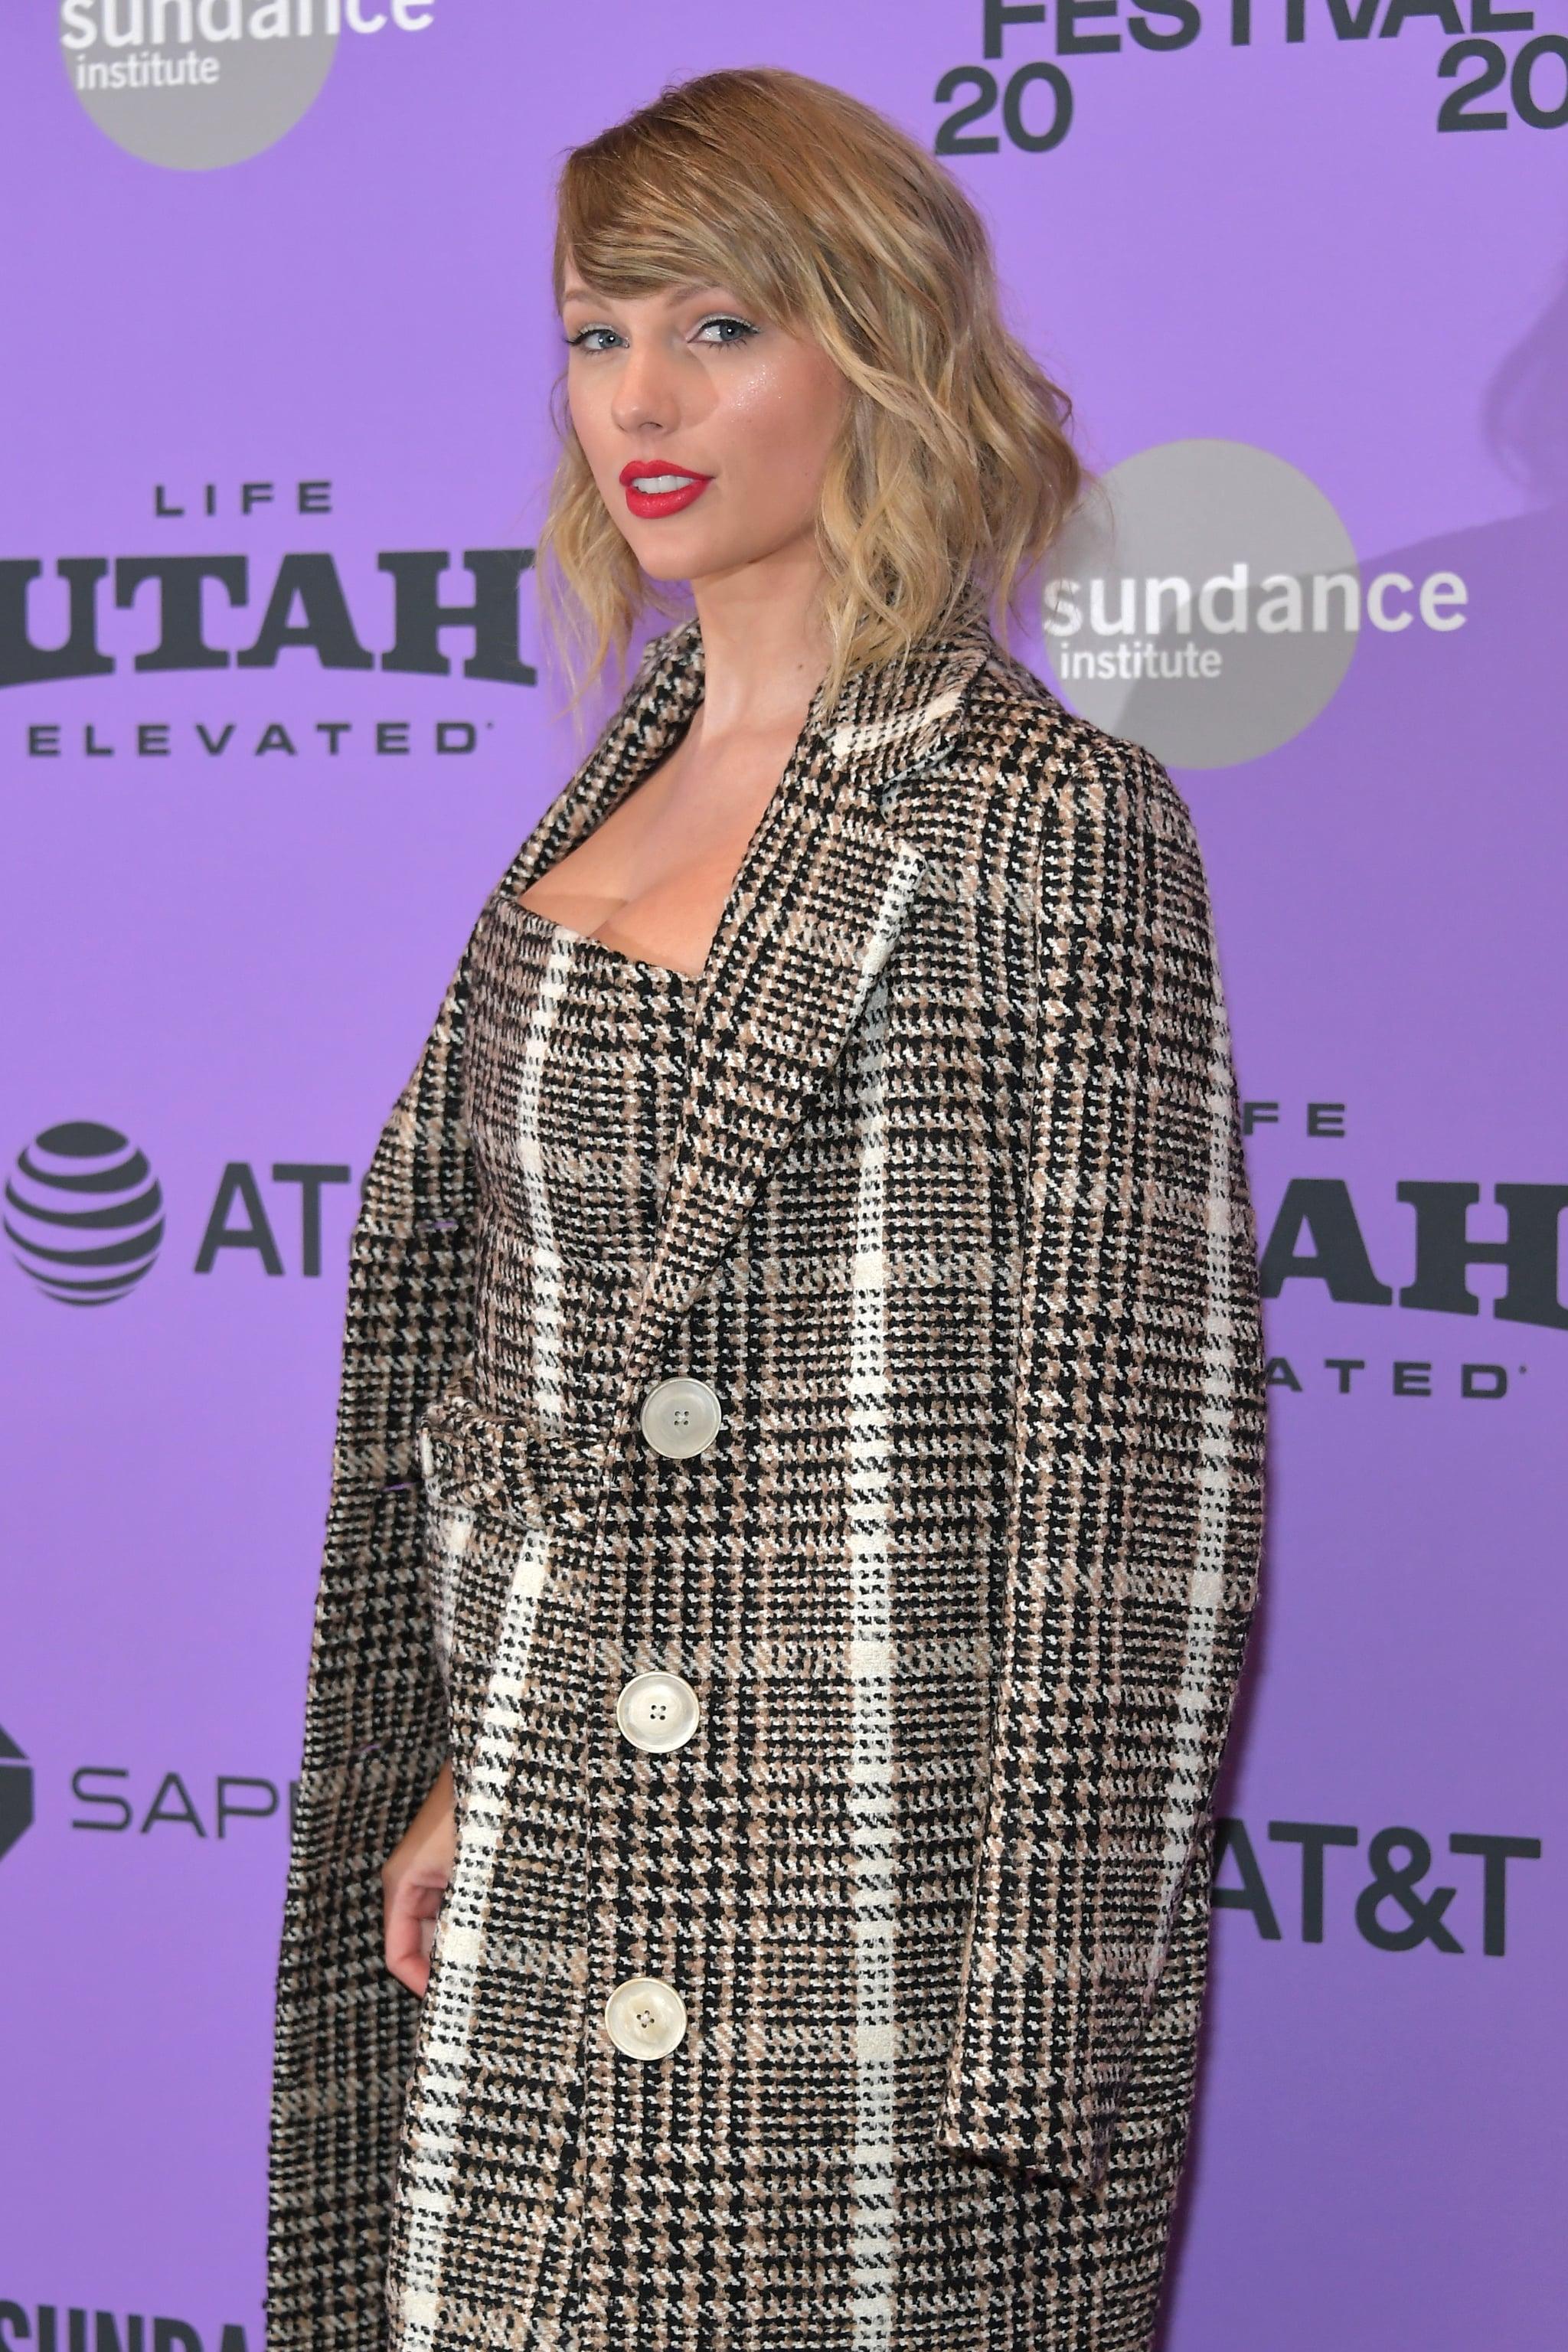 Women Taylor Swift Transparent See Through Plastic Bag Puebla Tecnm Mx